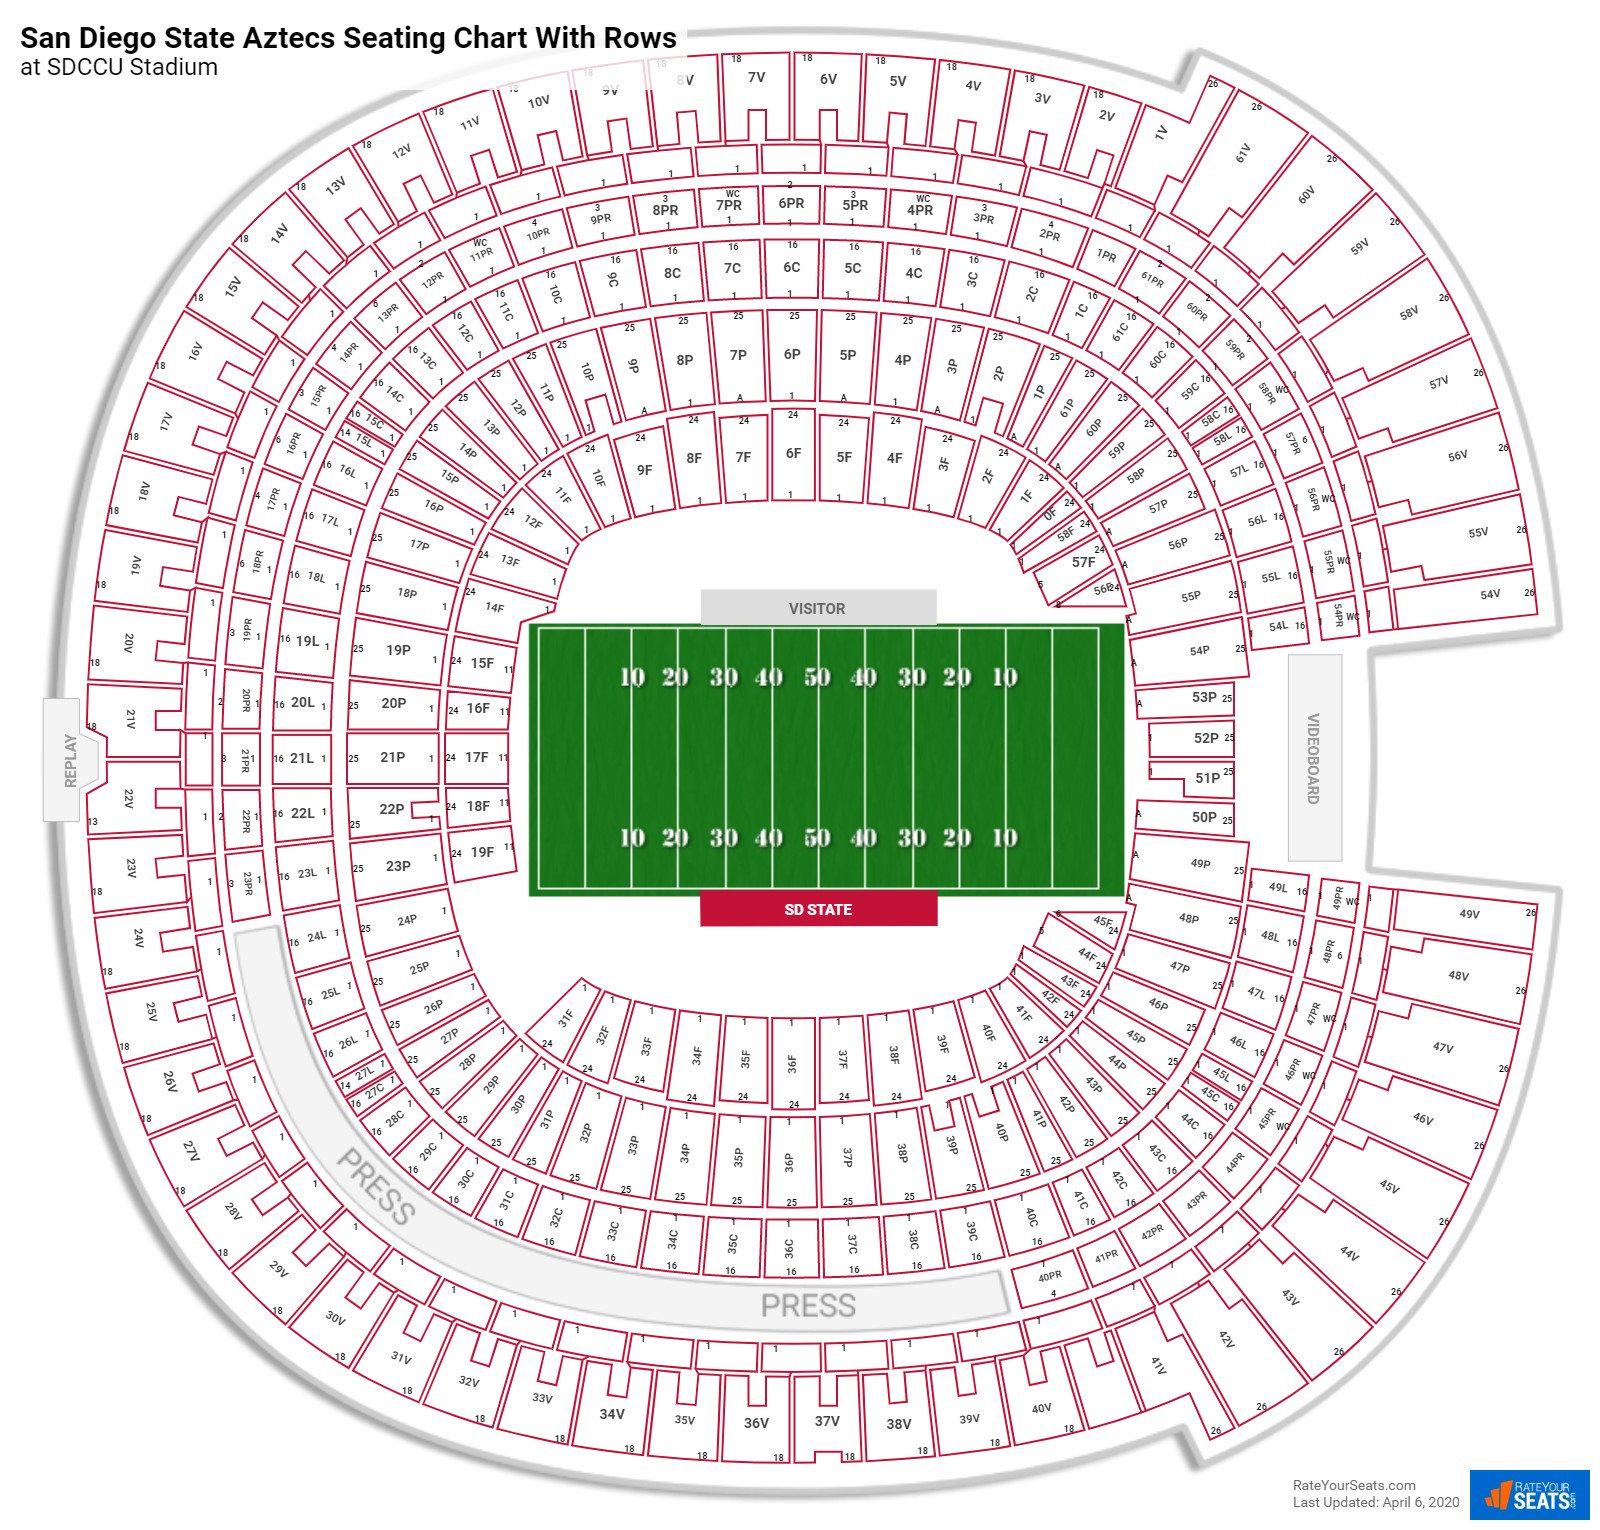 Sdccu Stadium Seating Charts Rateyourseats Com